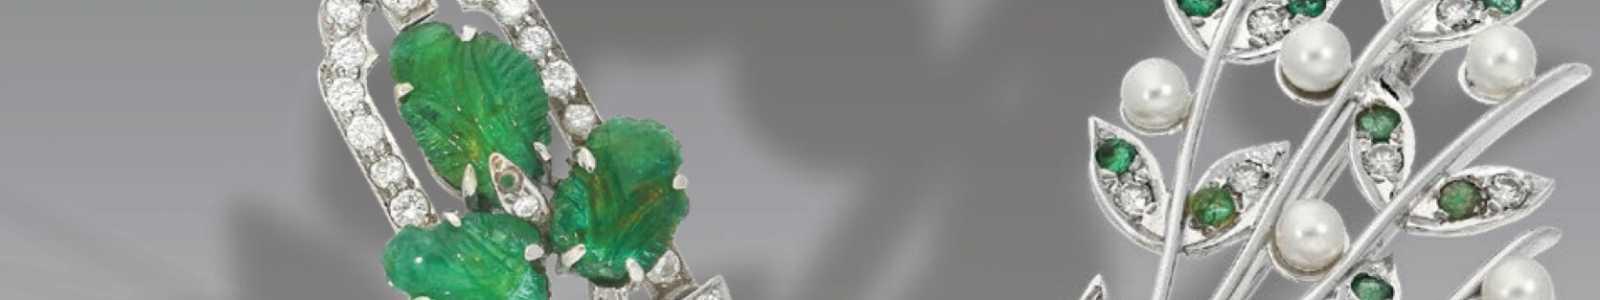 Fine jewellery - Antique to Modern